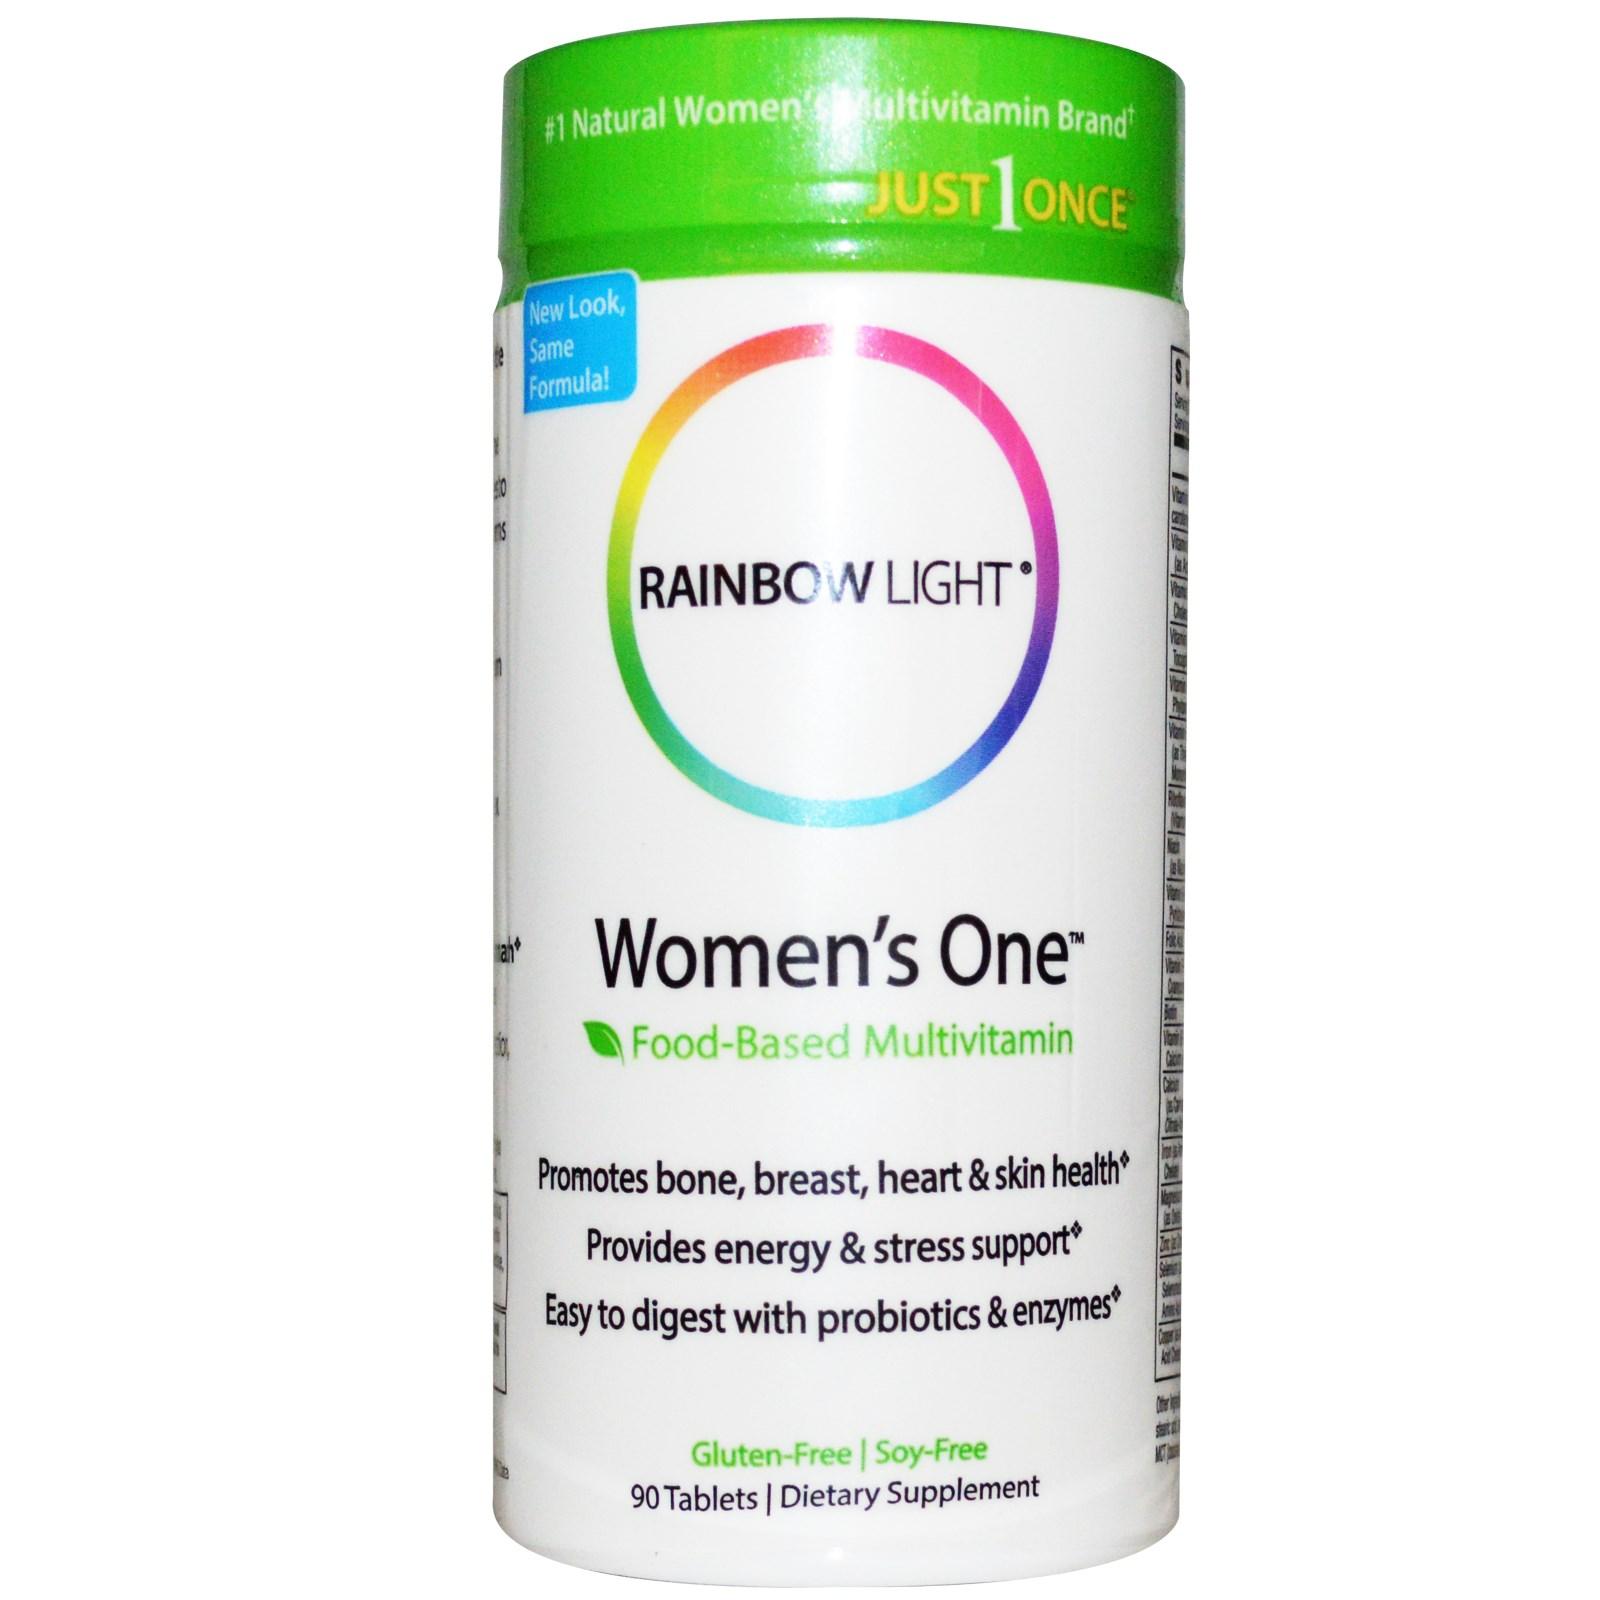 Rainbow Light Just Once Women's One Food-Based Multivitamin 90 Tablets